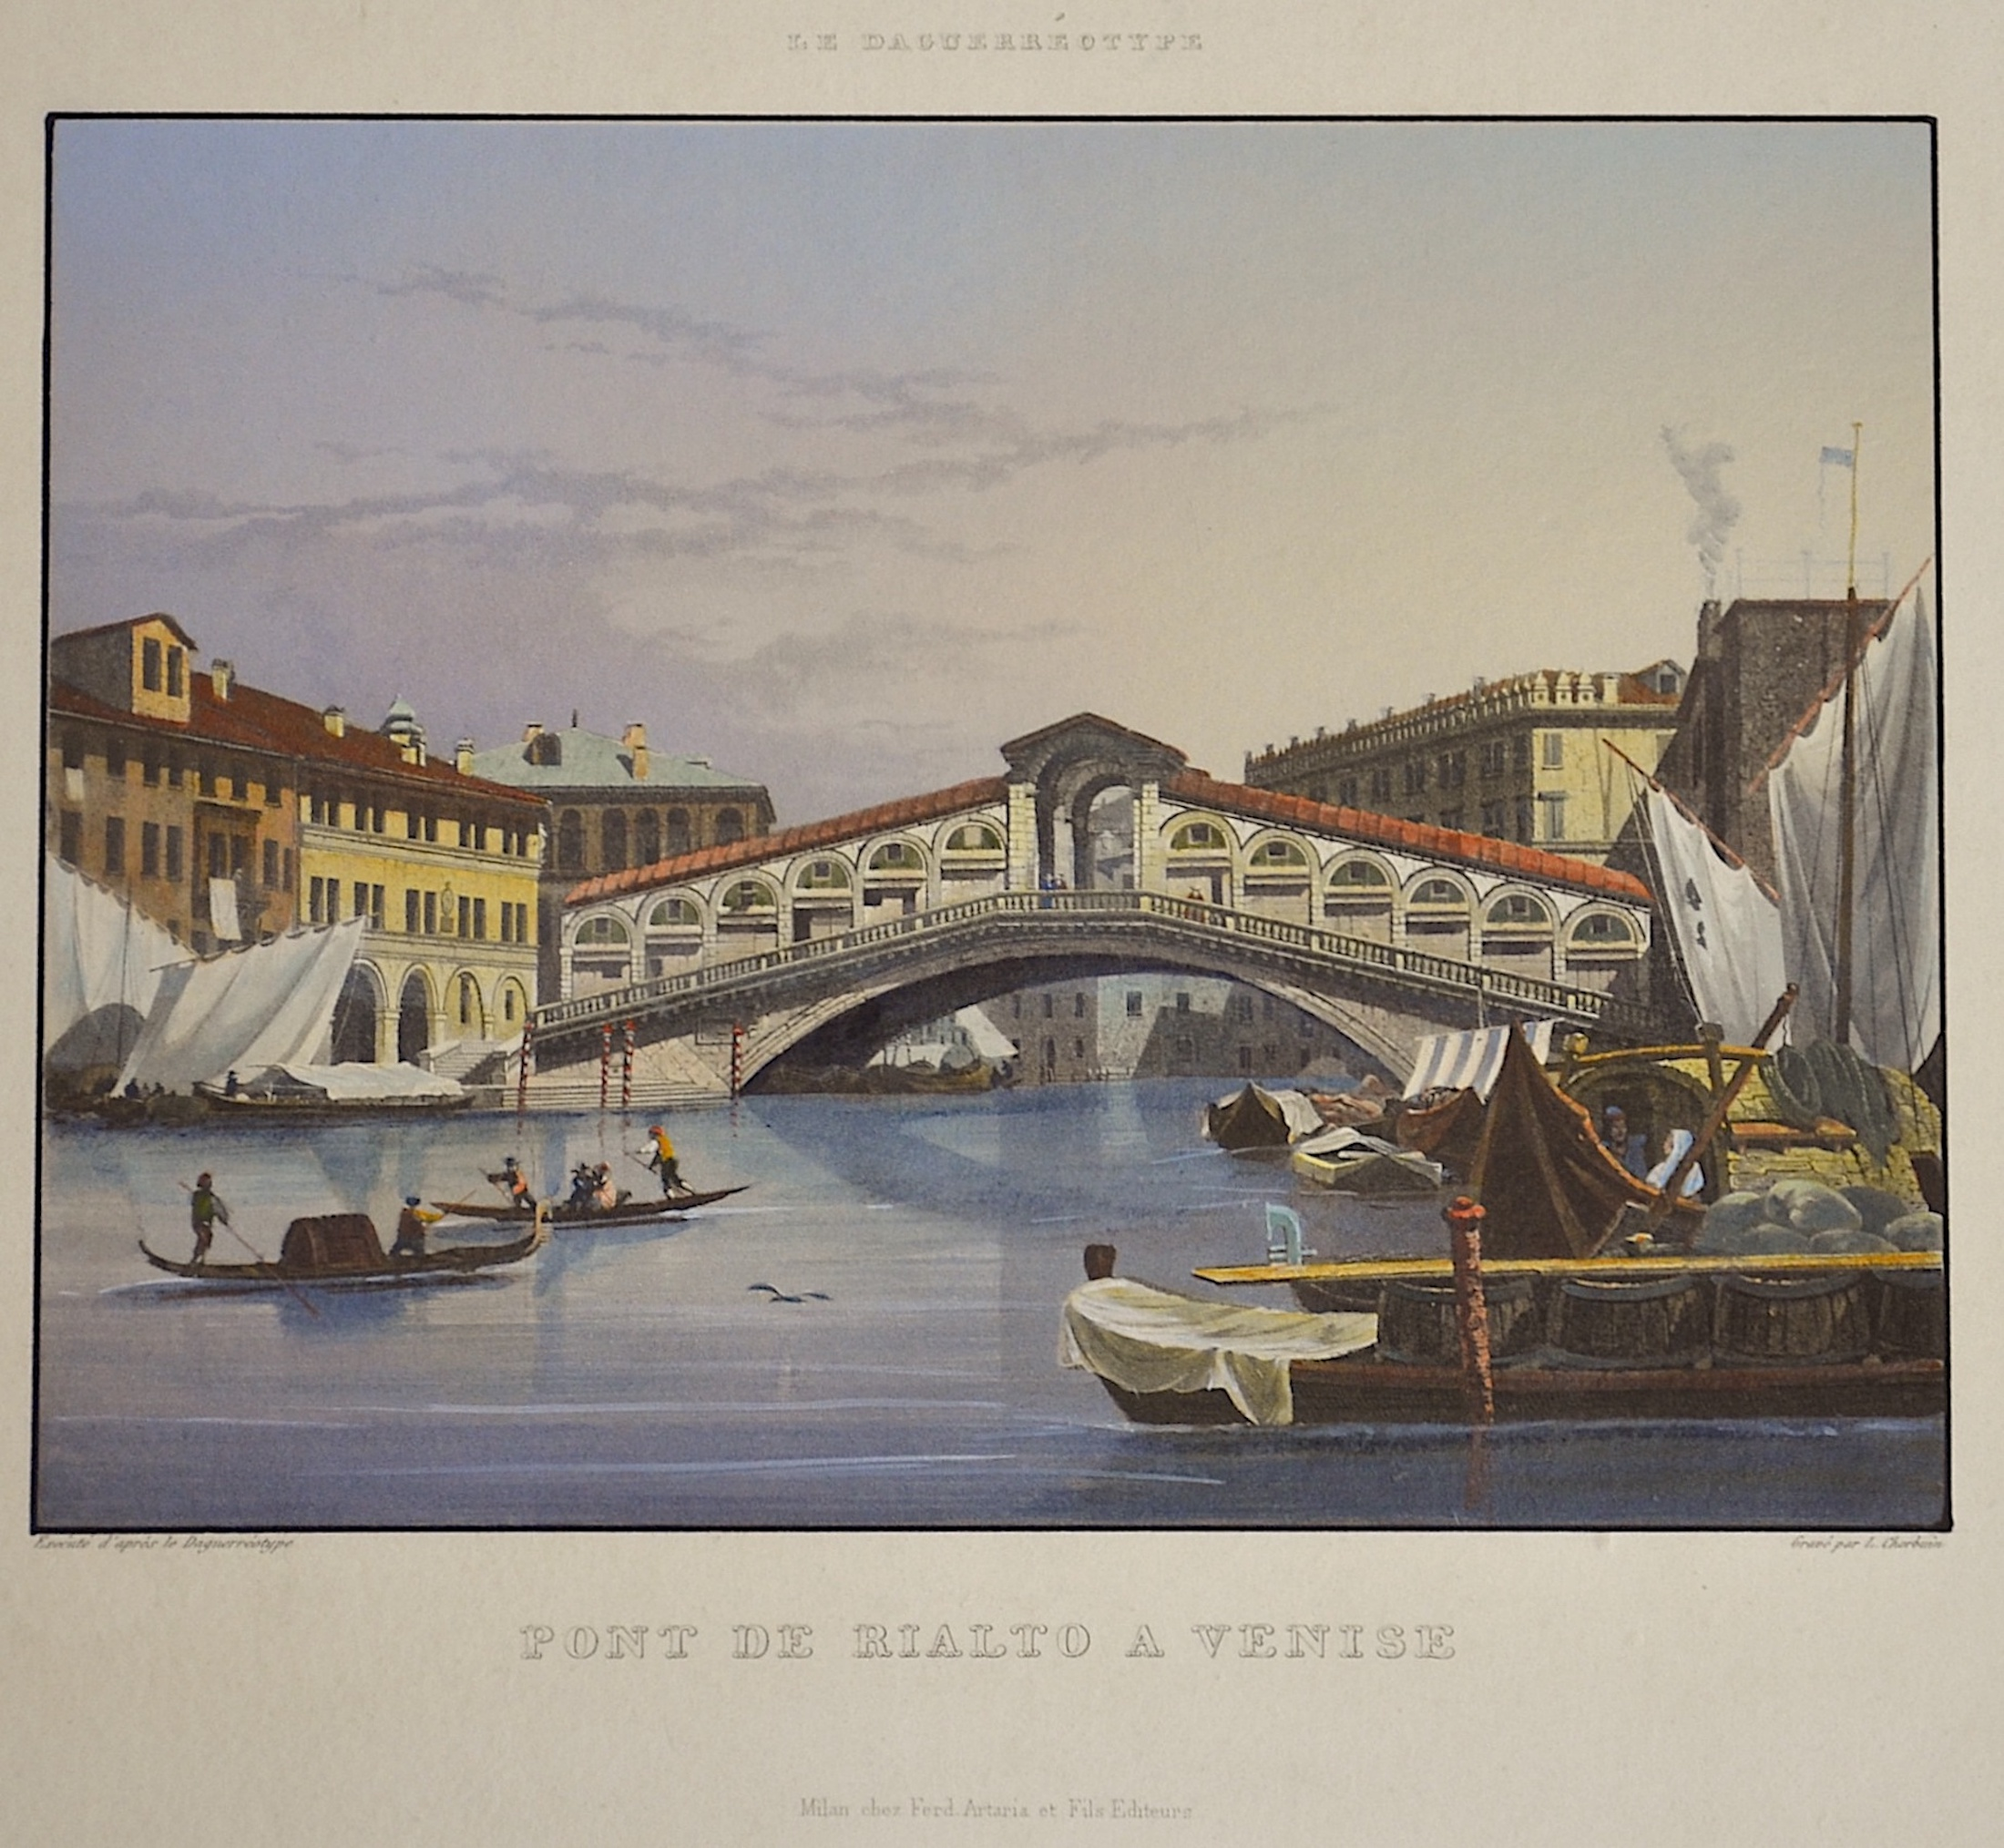 Cherbuin  Pont de Rialto a Venice